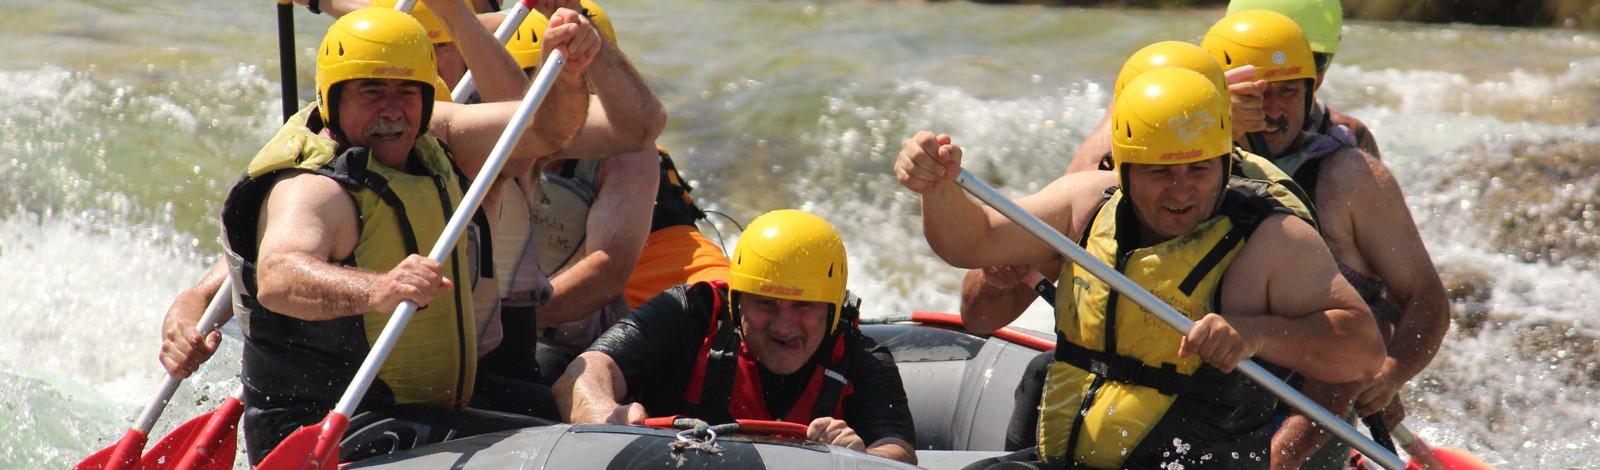 Rafting E.Bayer Bad-Tölz